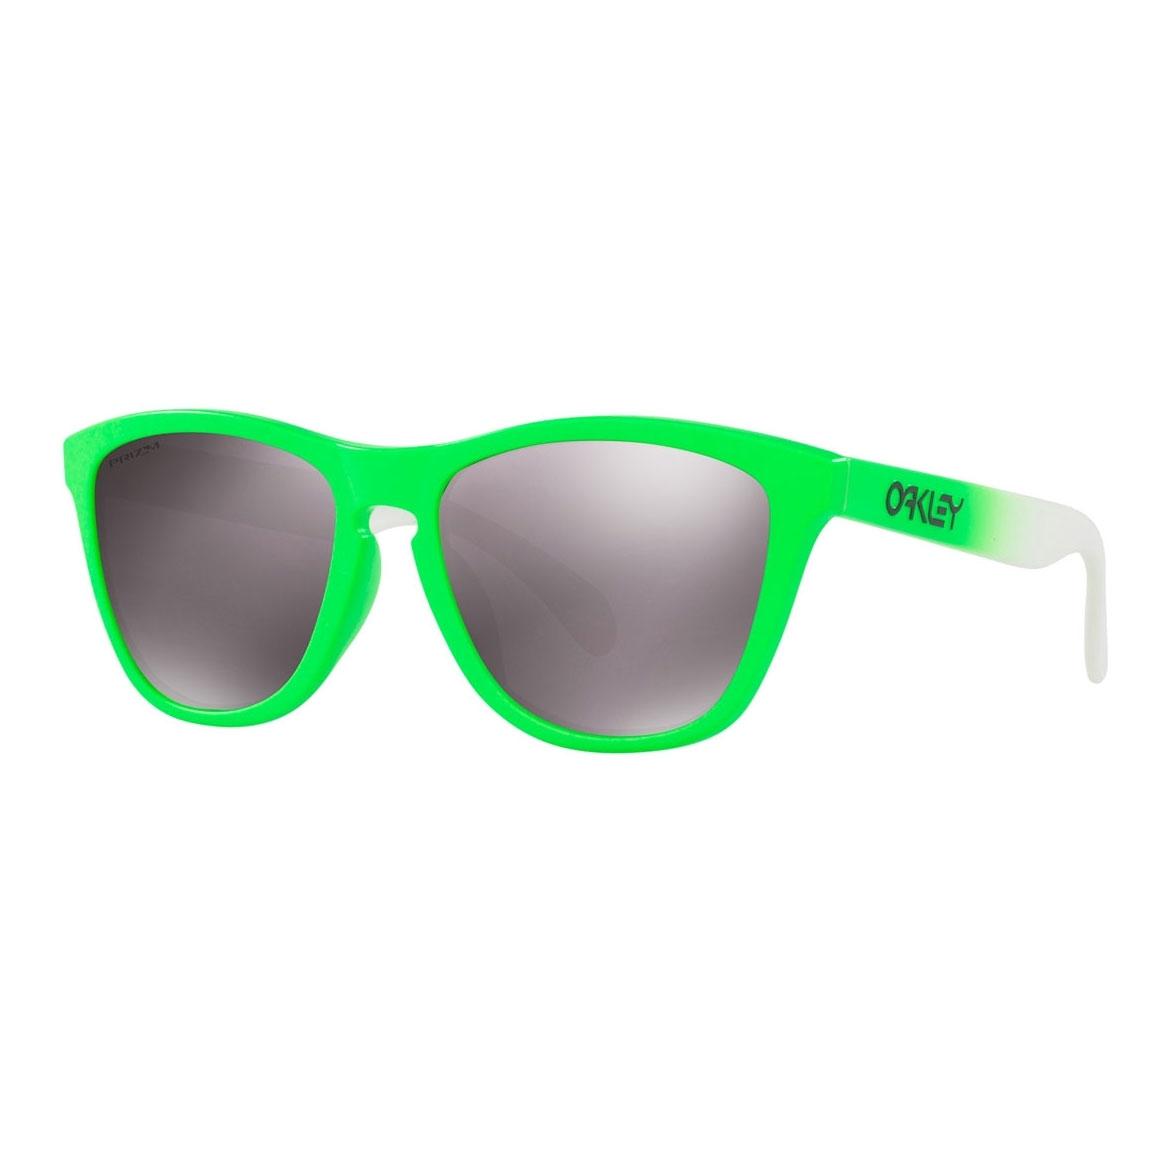 1913d4b98f22 Image of Oakley Frogskins Prizm Daily Polarized Sunglasses - Green Fade  Frame Prizm Daily Polarized